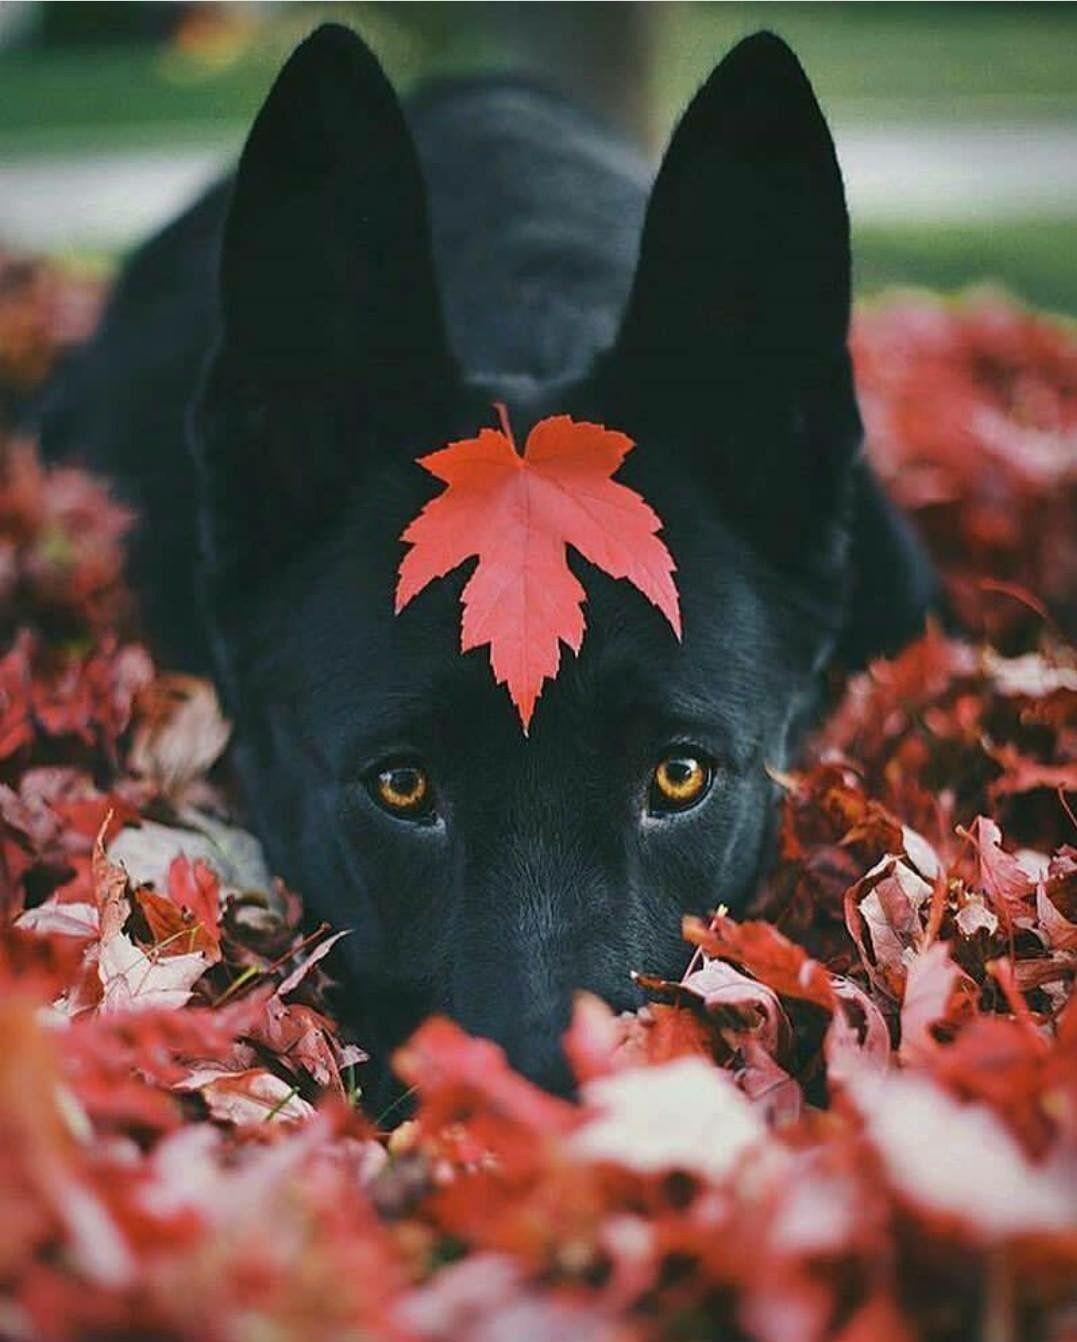 Lustige Bilder Hundebabys - Lustige Bilder Hundebabys